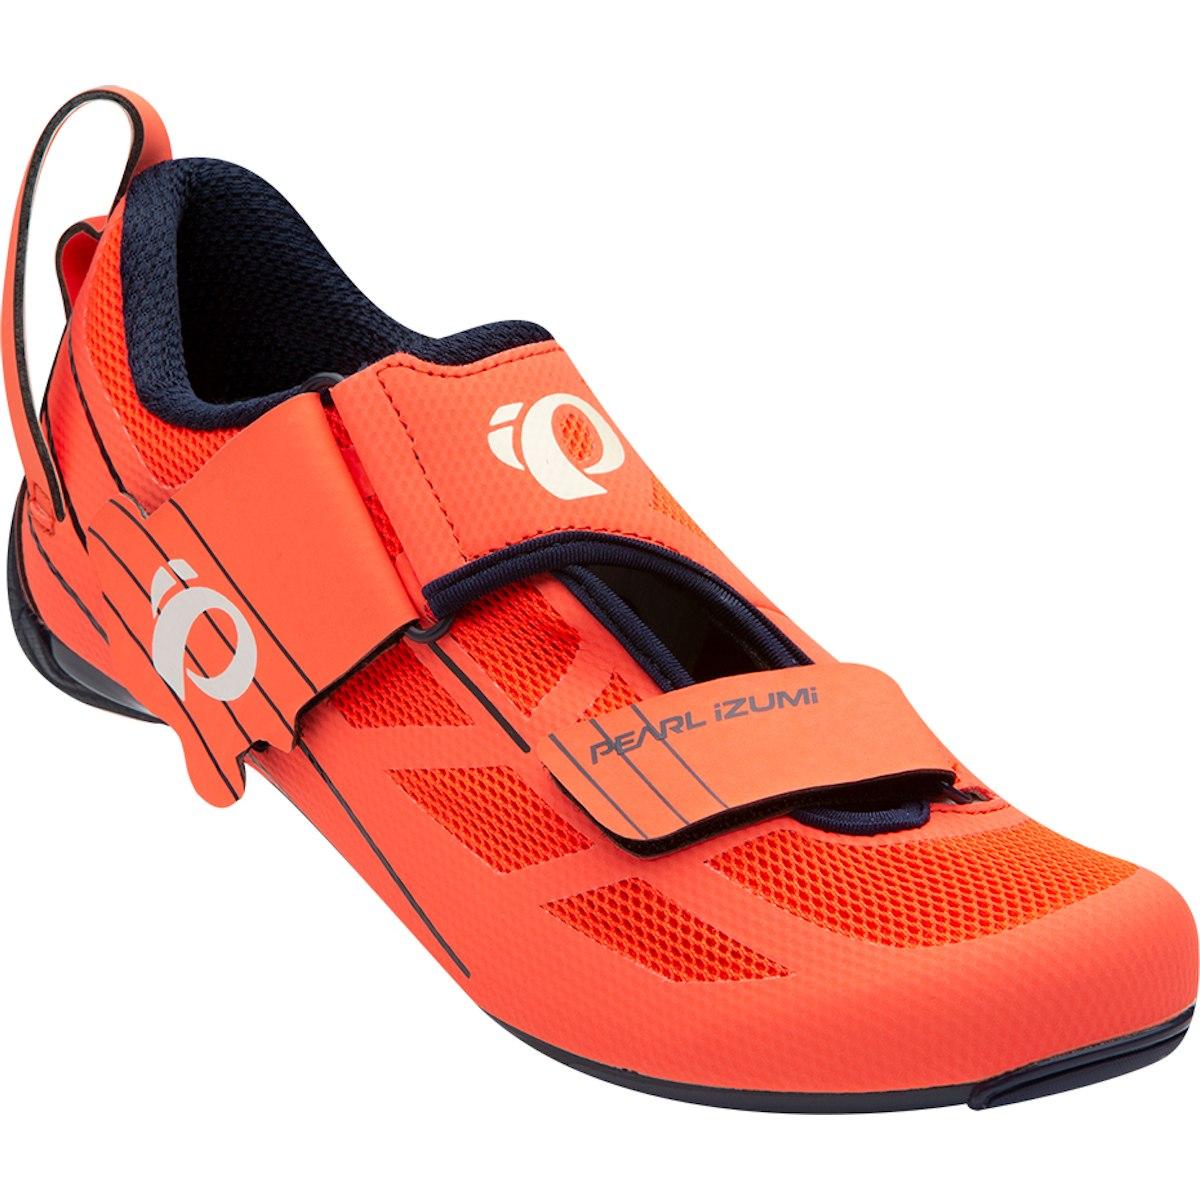 Produktbild von PEARL iZUMi Tri Fly SELECT v6 Damen-Triathlonschuh 15217003 - navy / fiery coral - 6XB